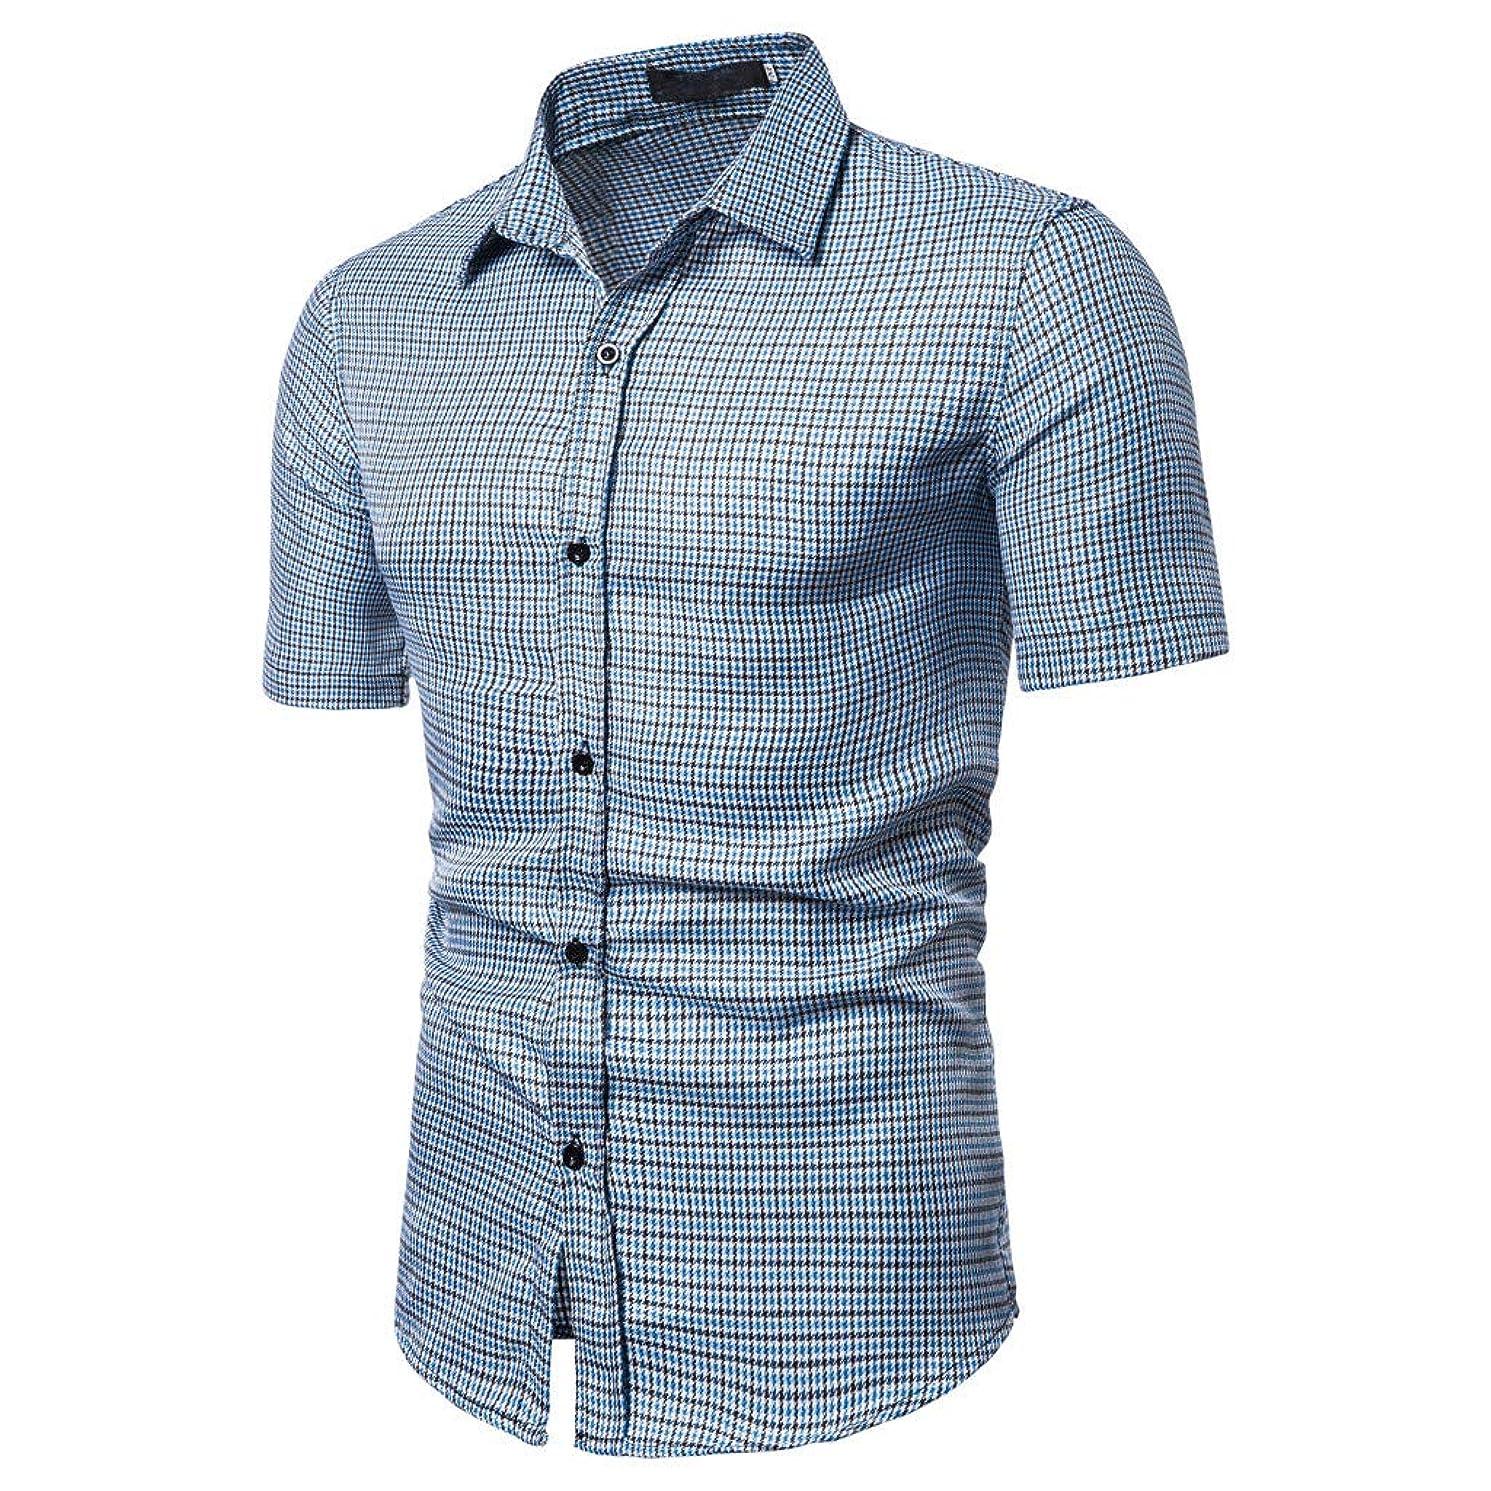 JJLIKER Men's Regular-Fit Short-Sleeve Plaid Shirt Casual Business Button Down Shirts Classic Formal Tops